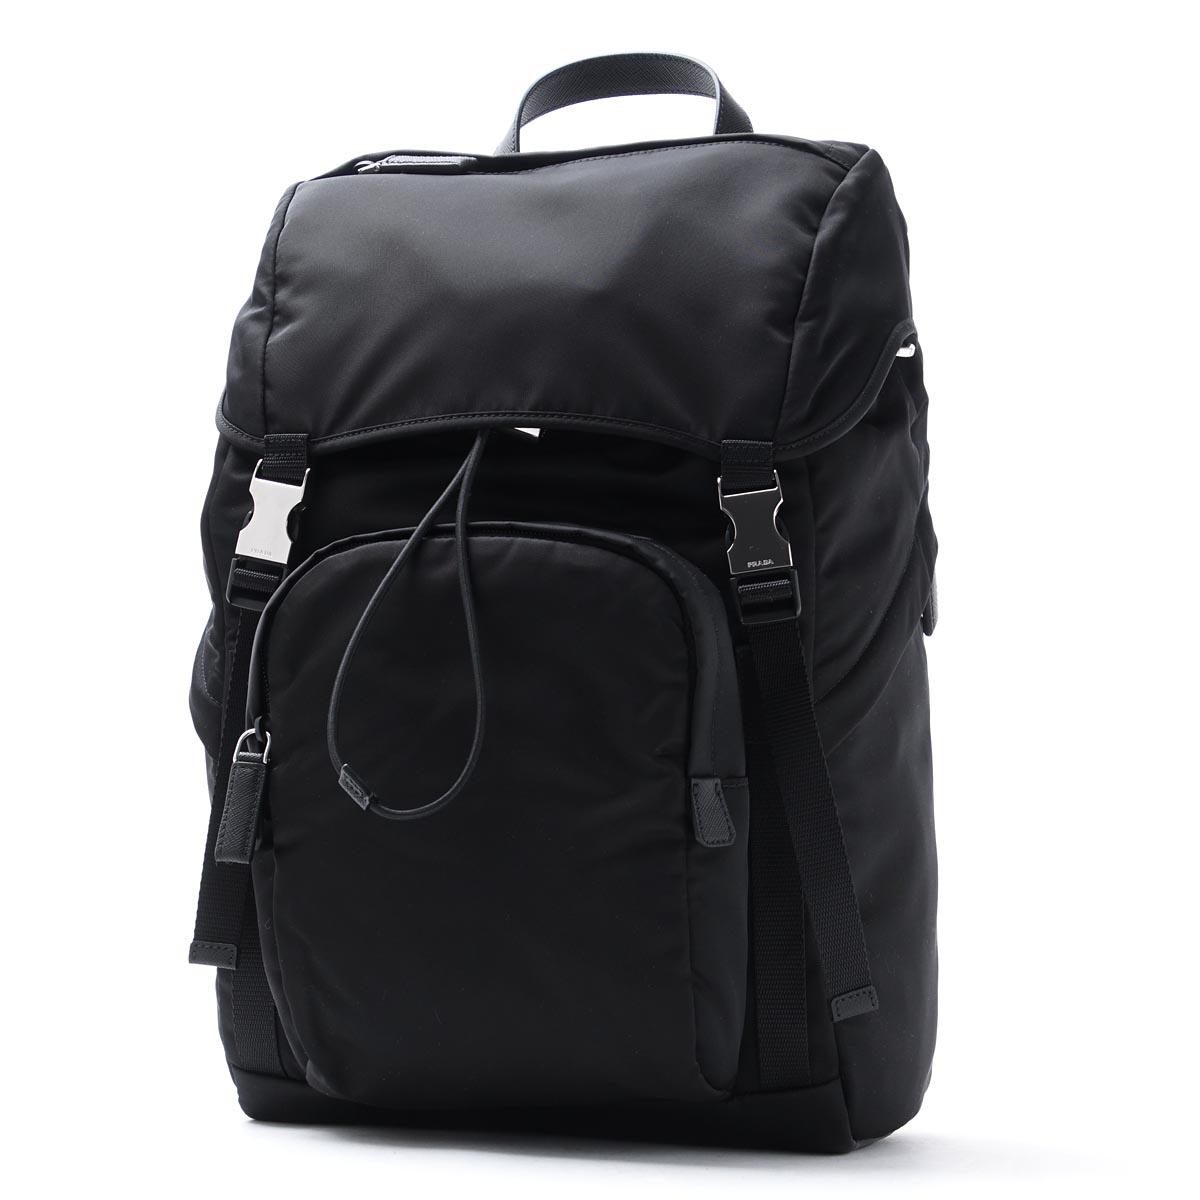 e630f0f186c7 ... promo code for prada prada backpack black men backpack bag commuting  2vz135 973 f0002 zaino tessuto ...